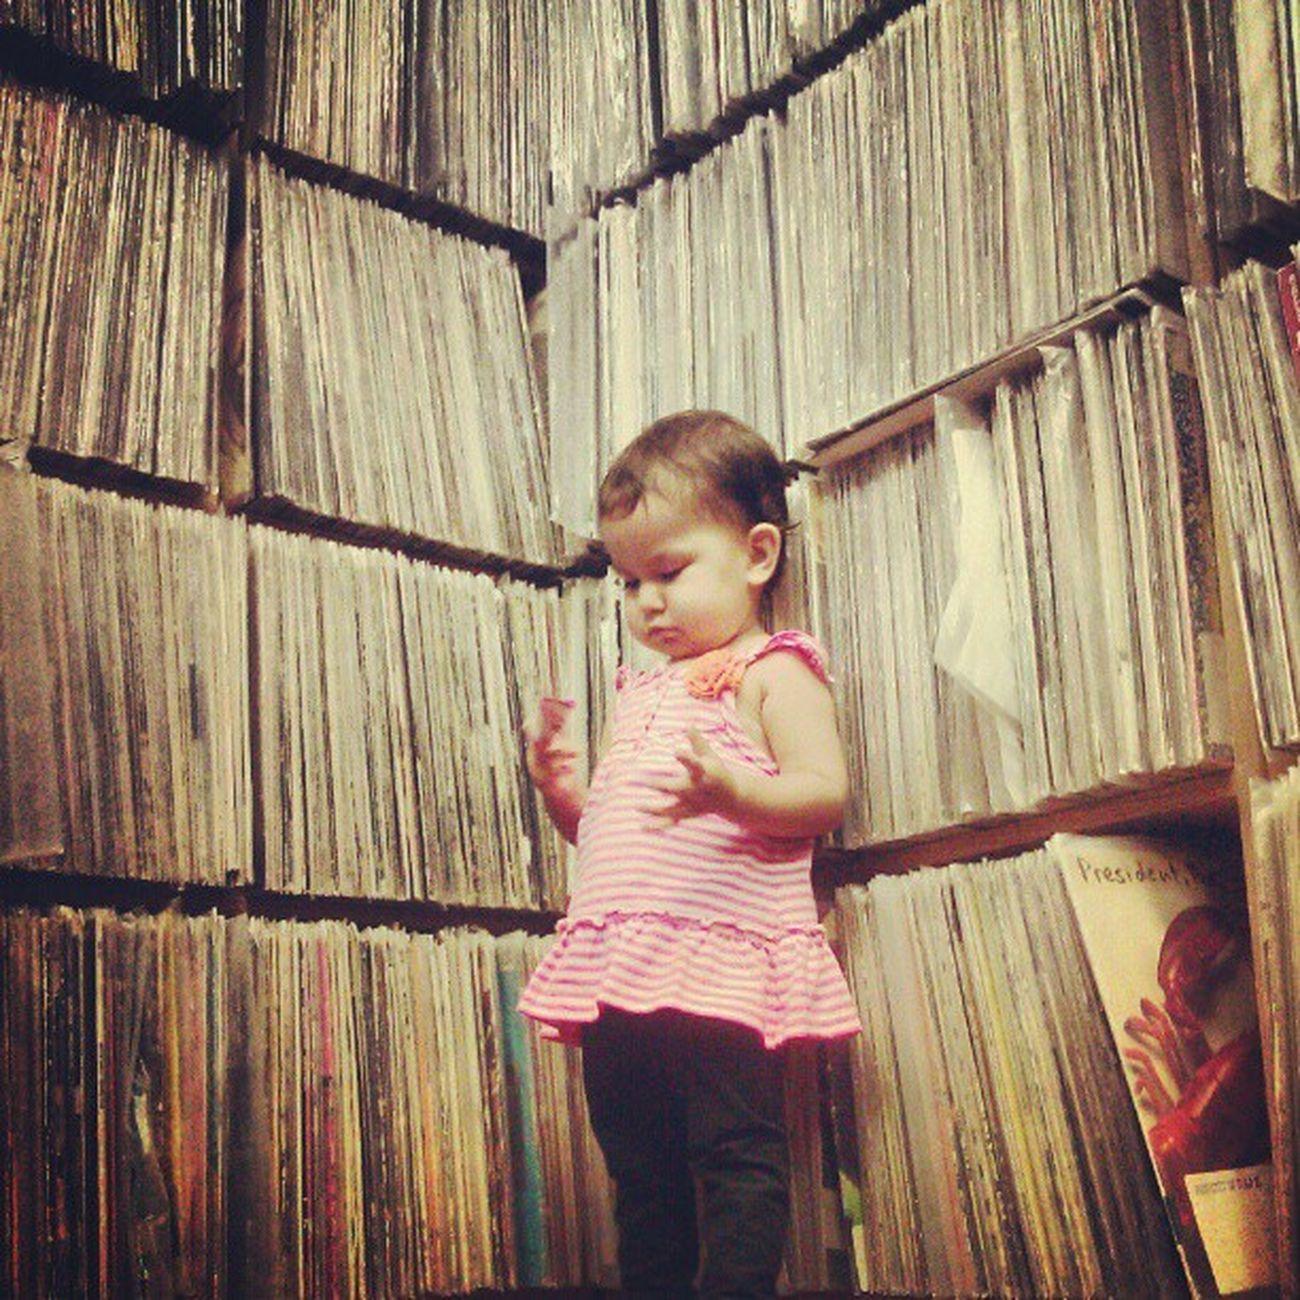 Reggaegoldradio Whpk Kayasol